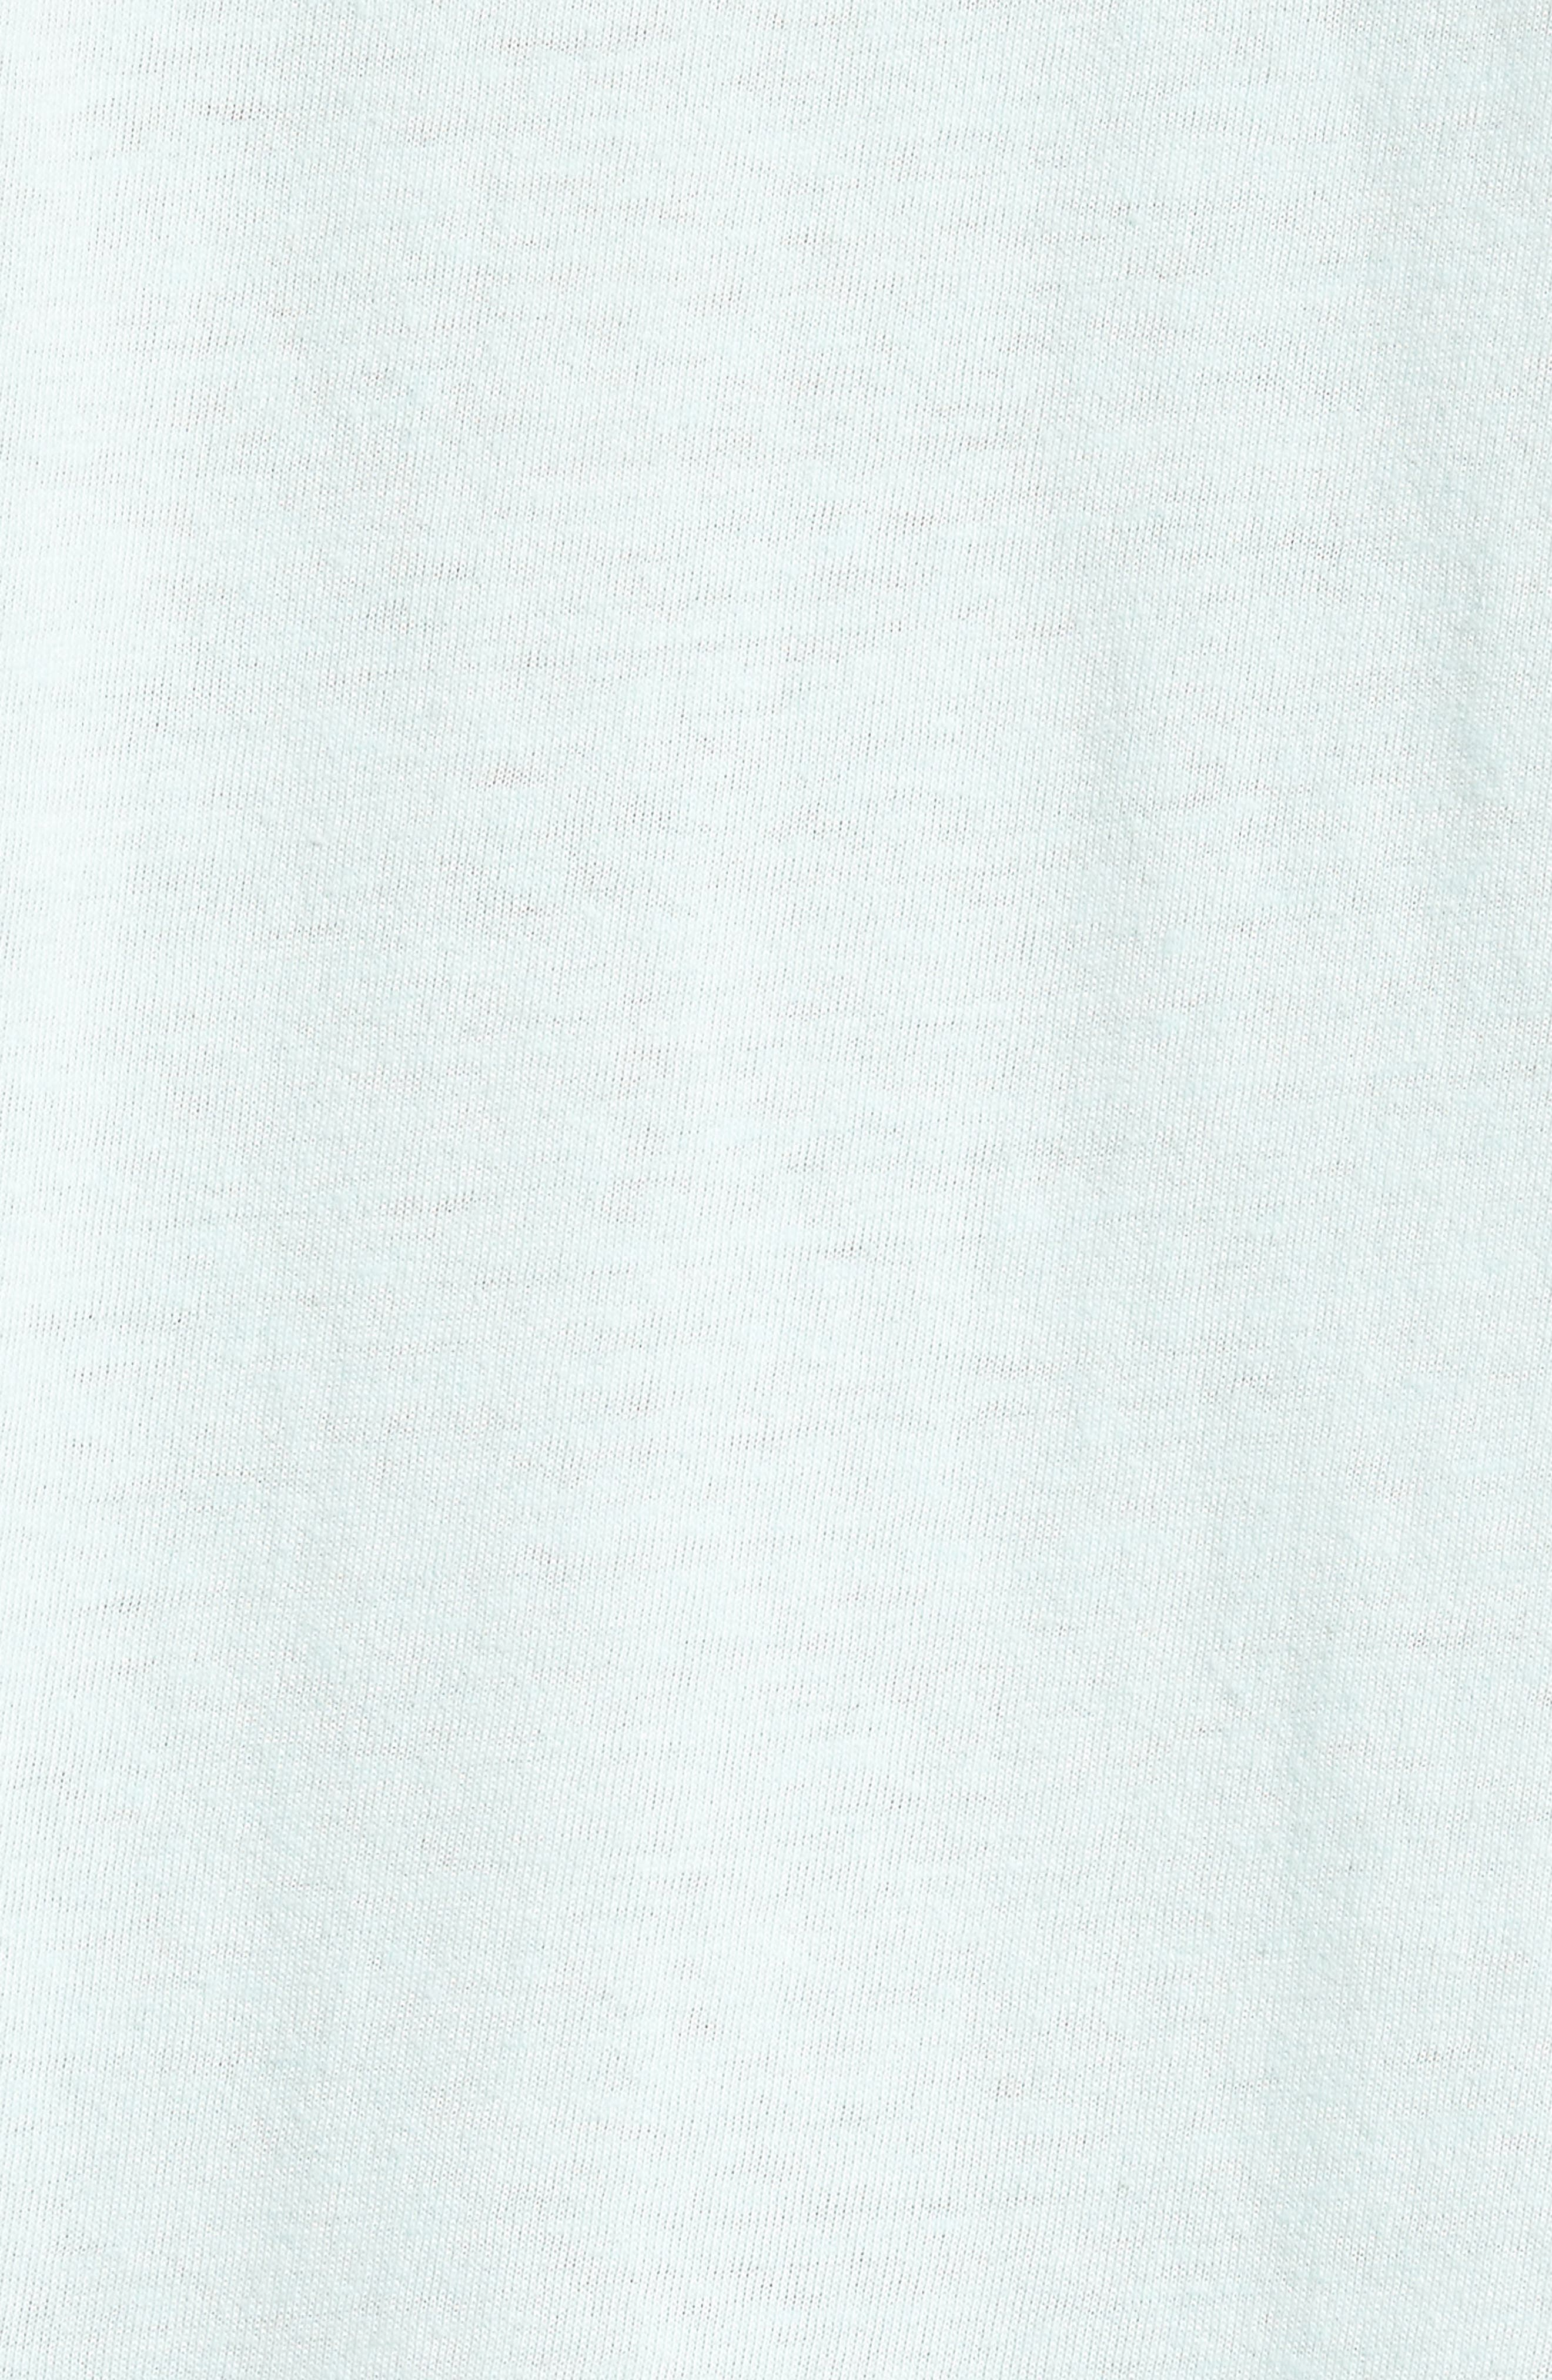 LA Slim Fit Heathered T-Shirt,                             Alternate thumbnail 13, color,